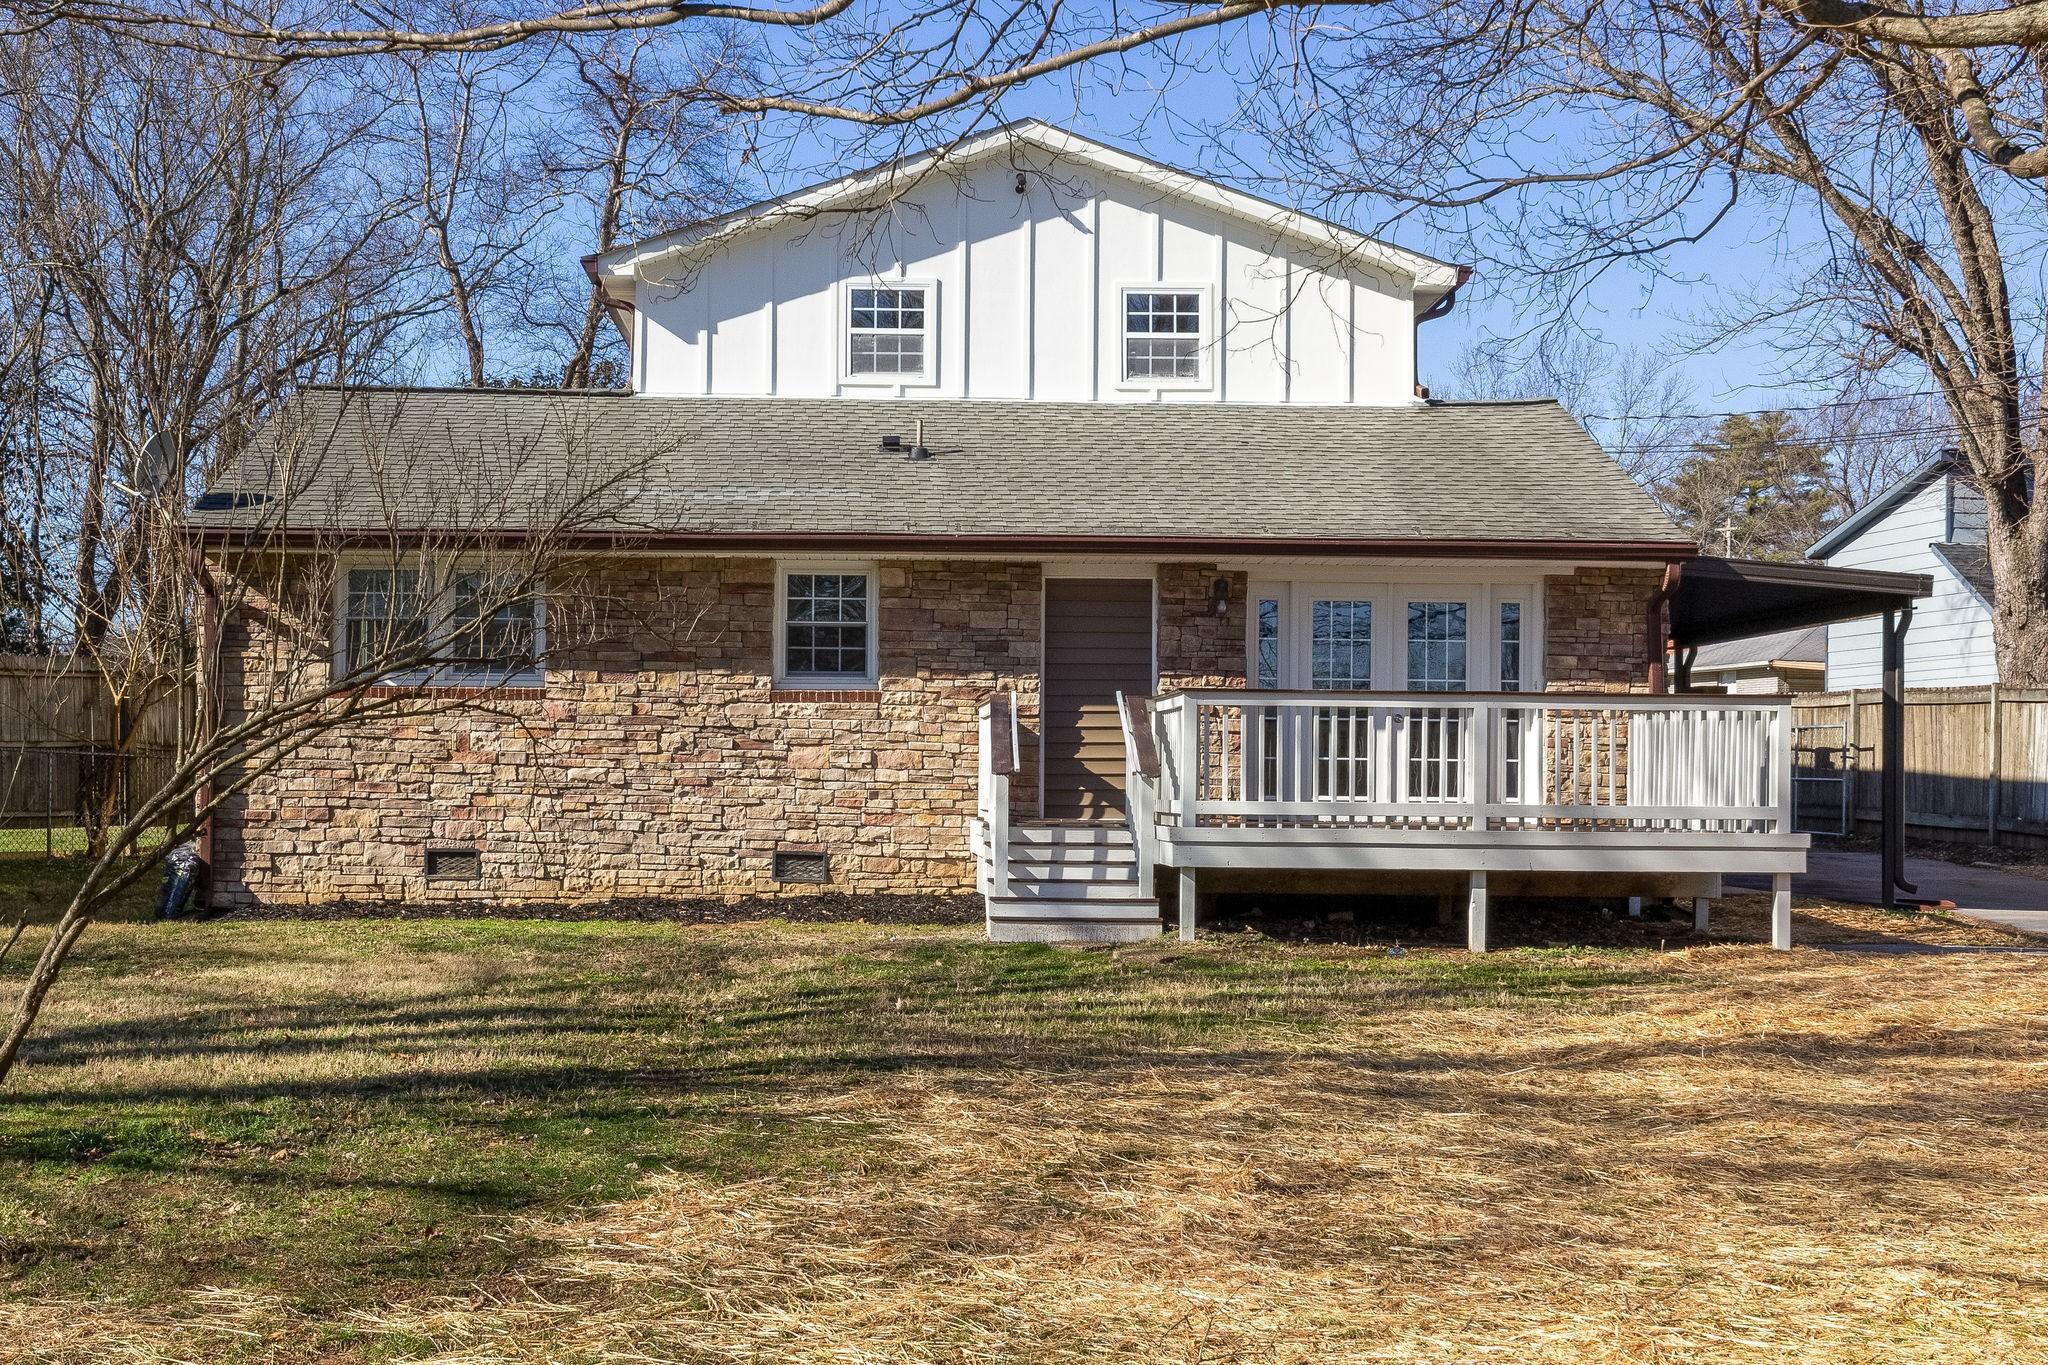 954 Colfax Dr, Nashville, TN 37214 - Nashville, TN real estate listing